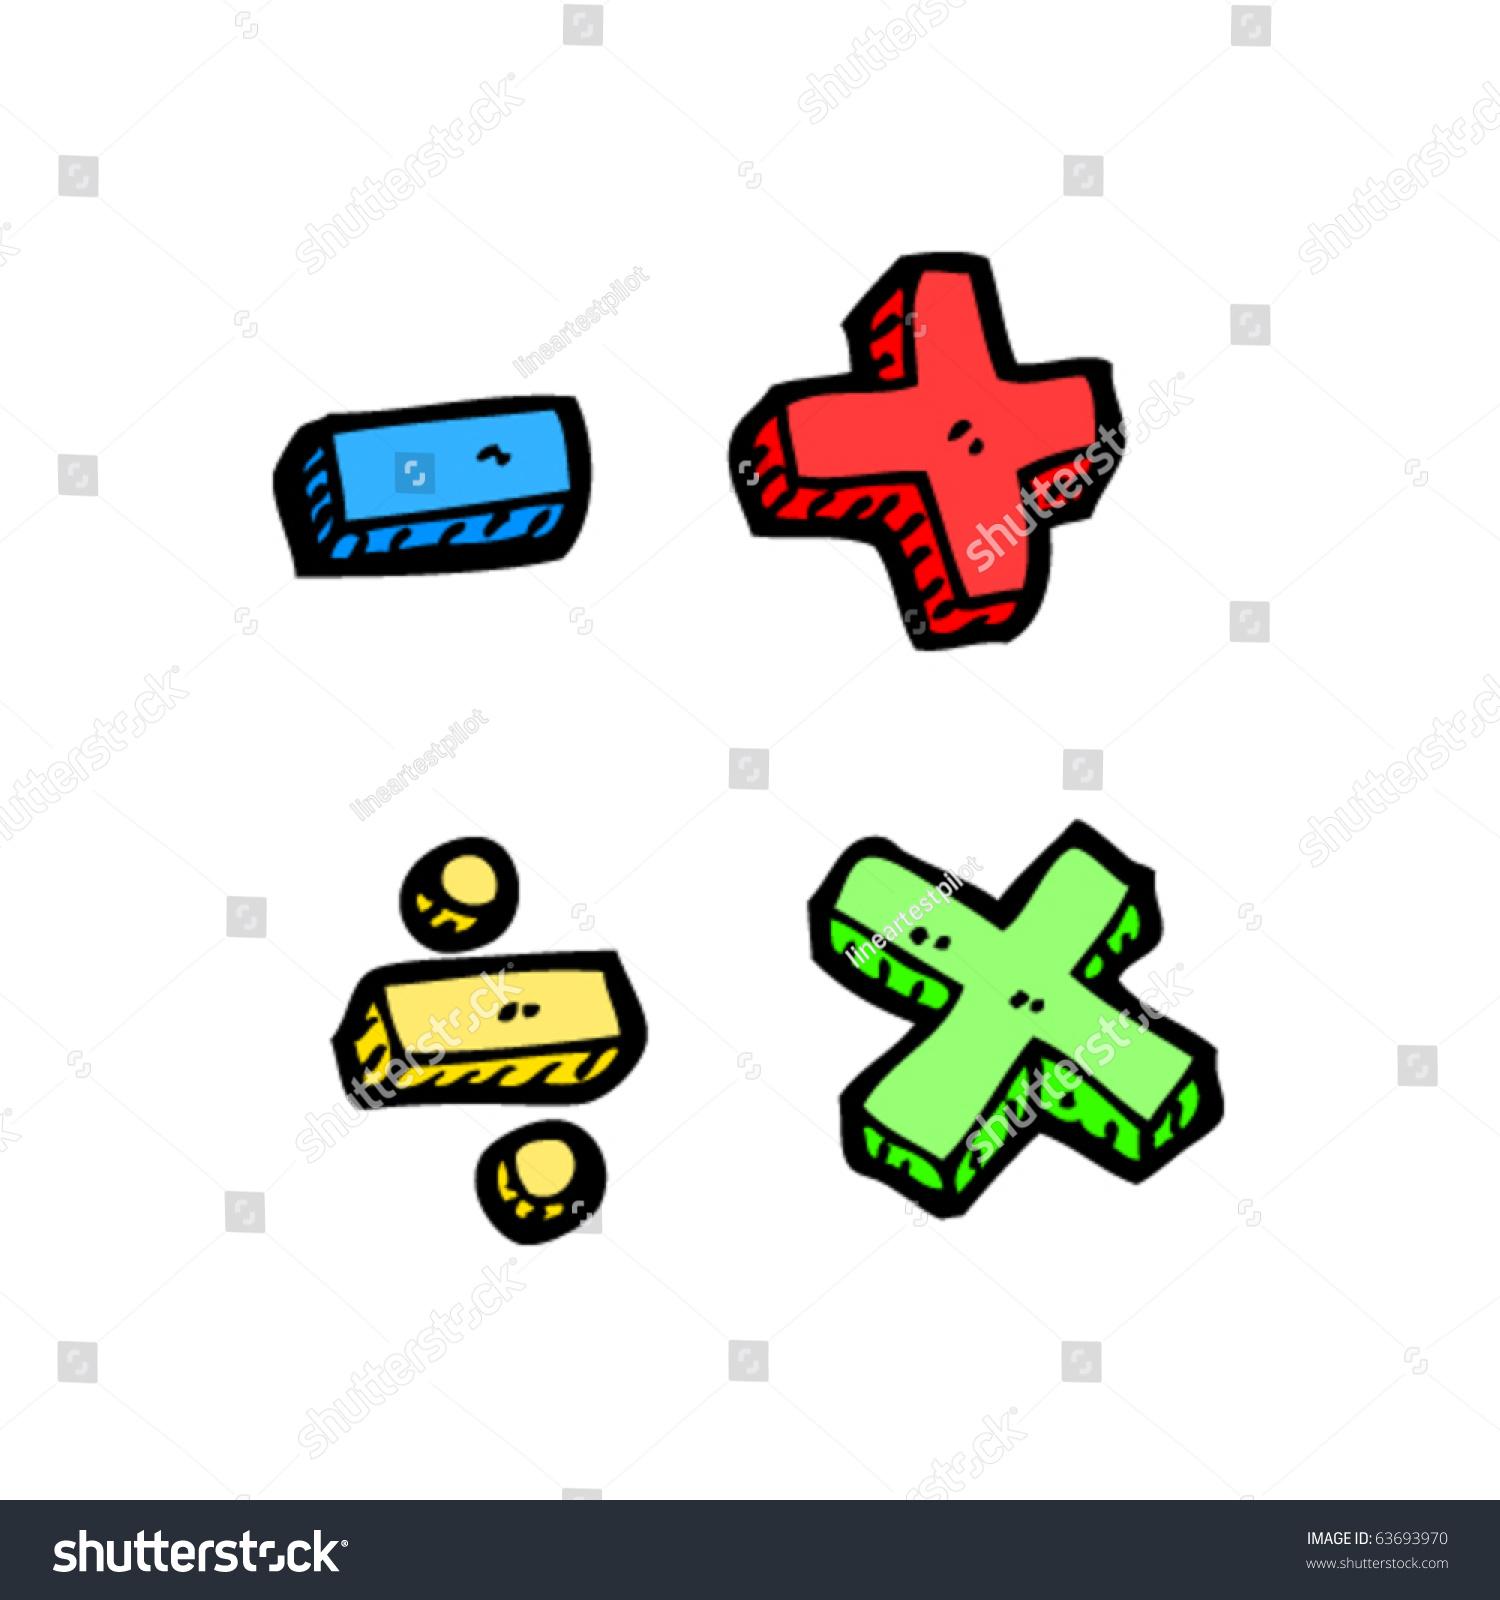 Maths symbols cartoon stock vector 63693970 shutterstock maths symbols cartoon buycottarizona